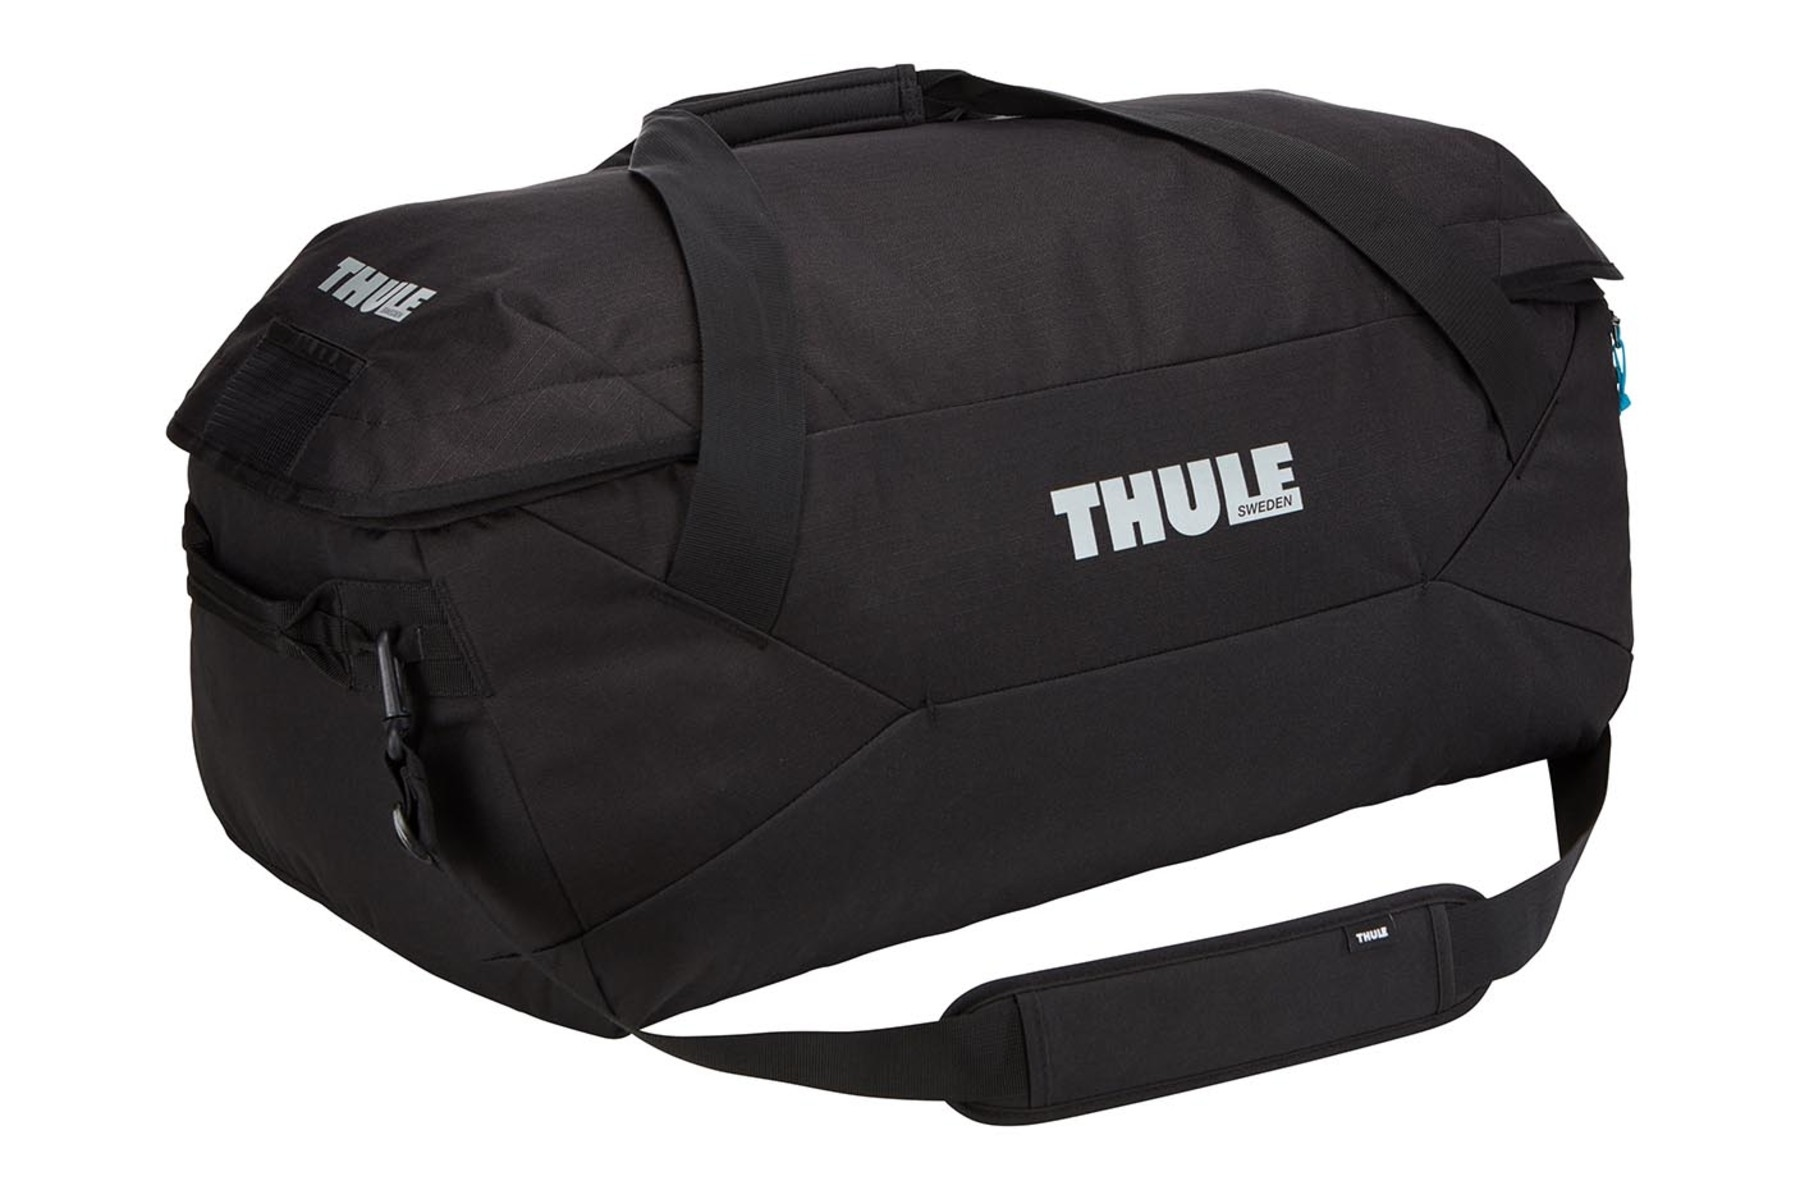 Thule GoPack Set (4x duffel) 8006